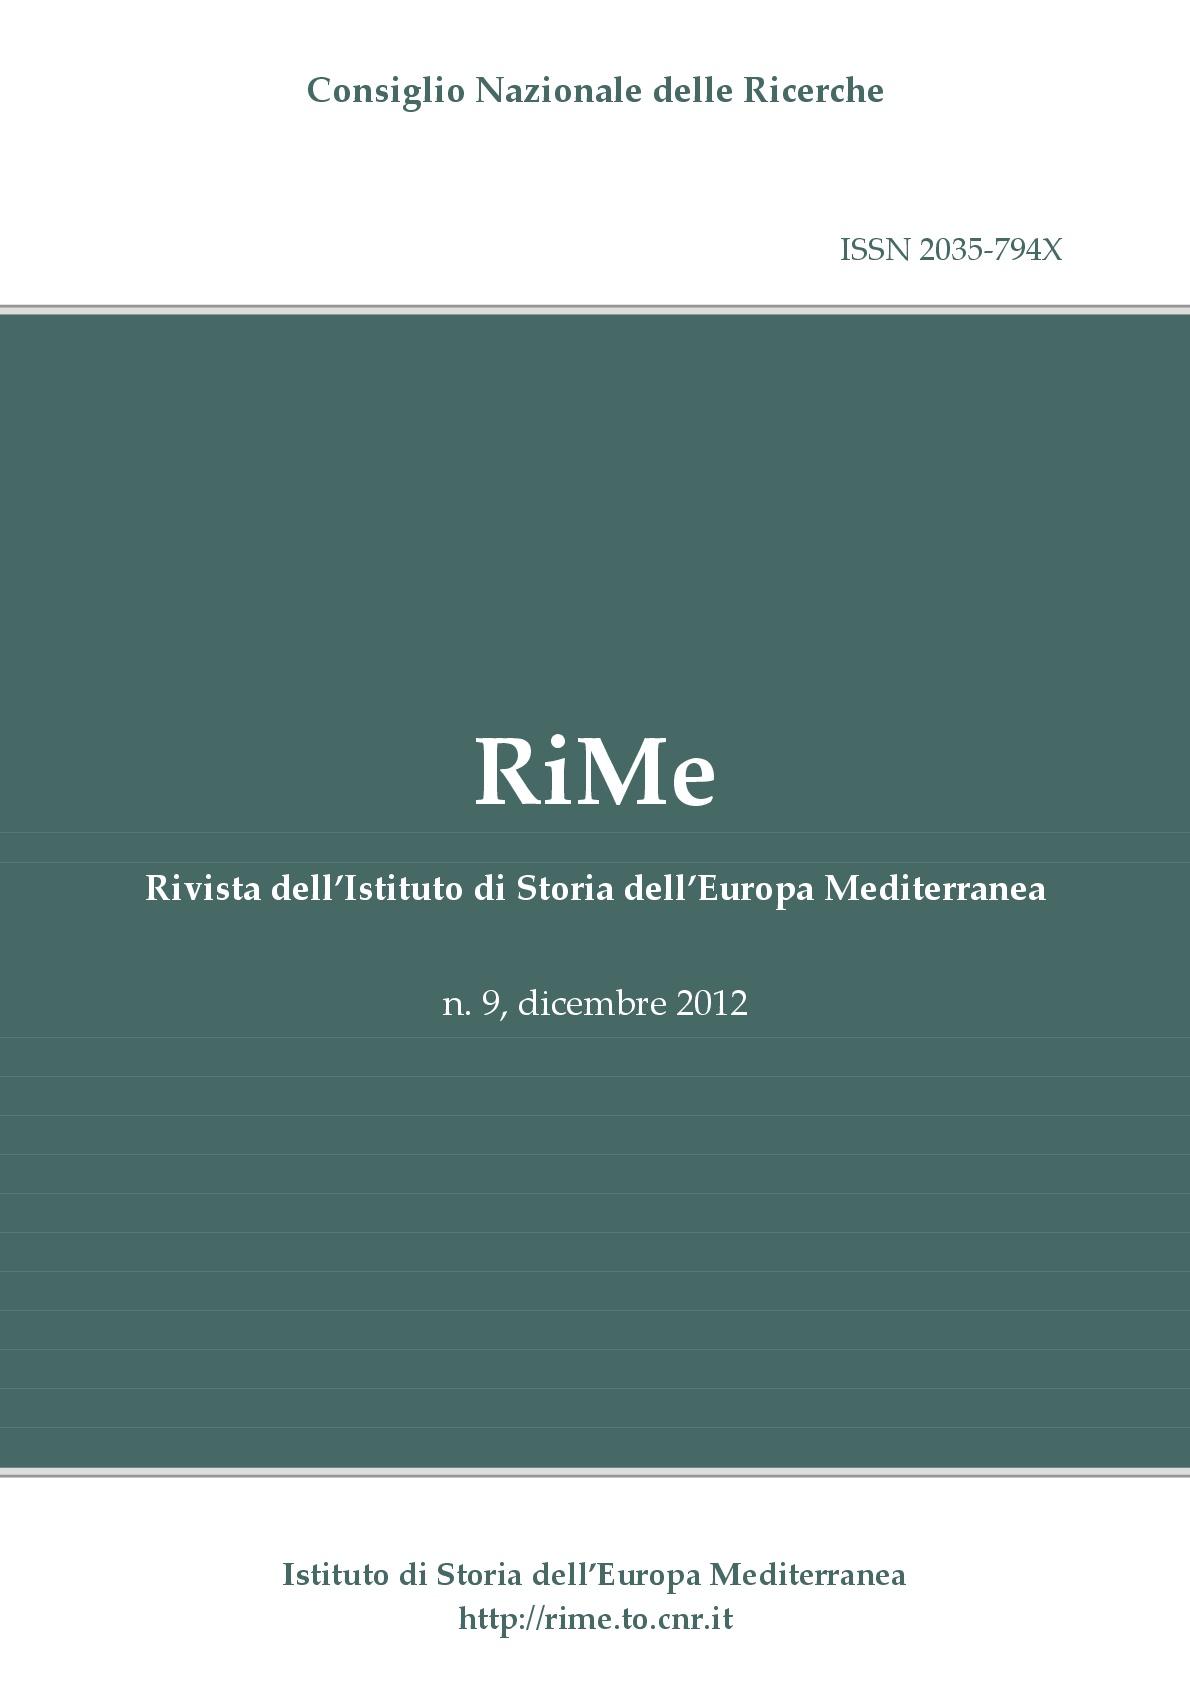 Vol. 9 (December 2012) cover